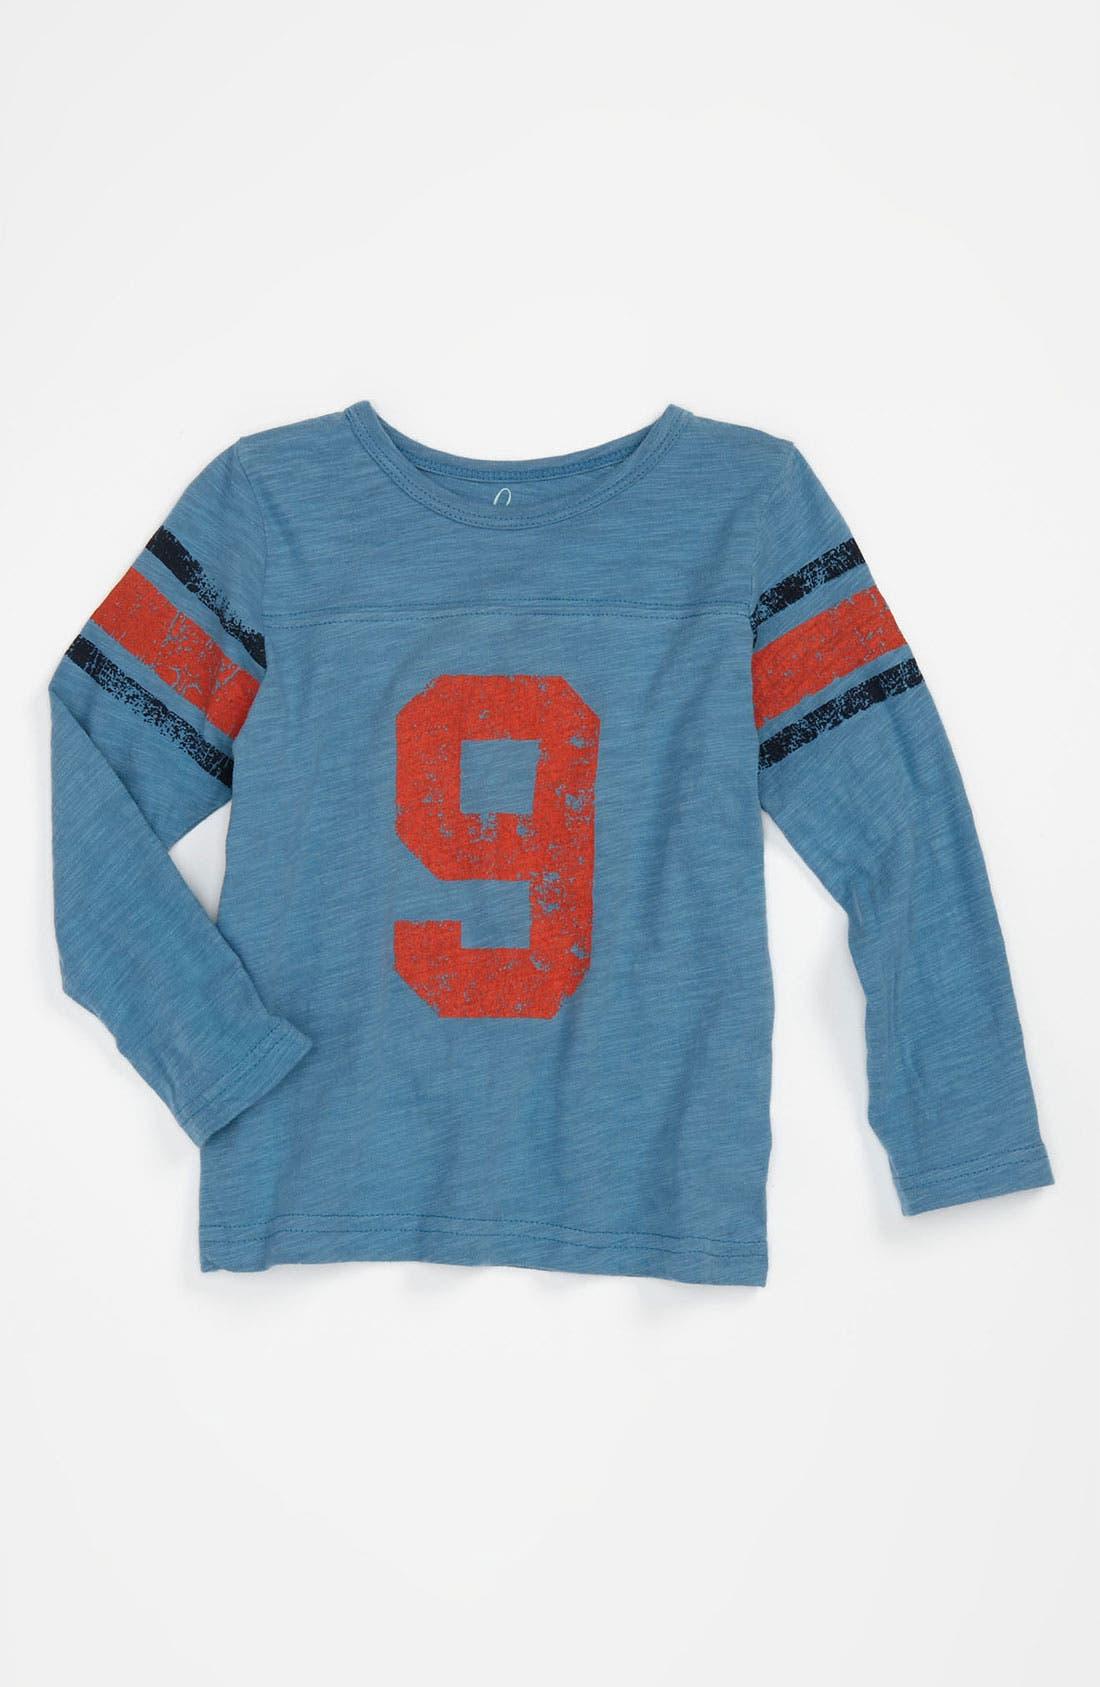 Alternate Image 1 Selected - Peek Long Sleeve Jersey Top (Infant)